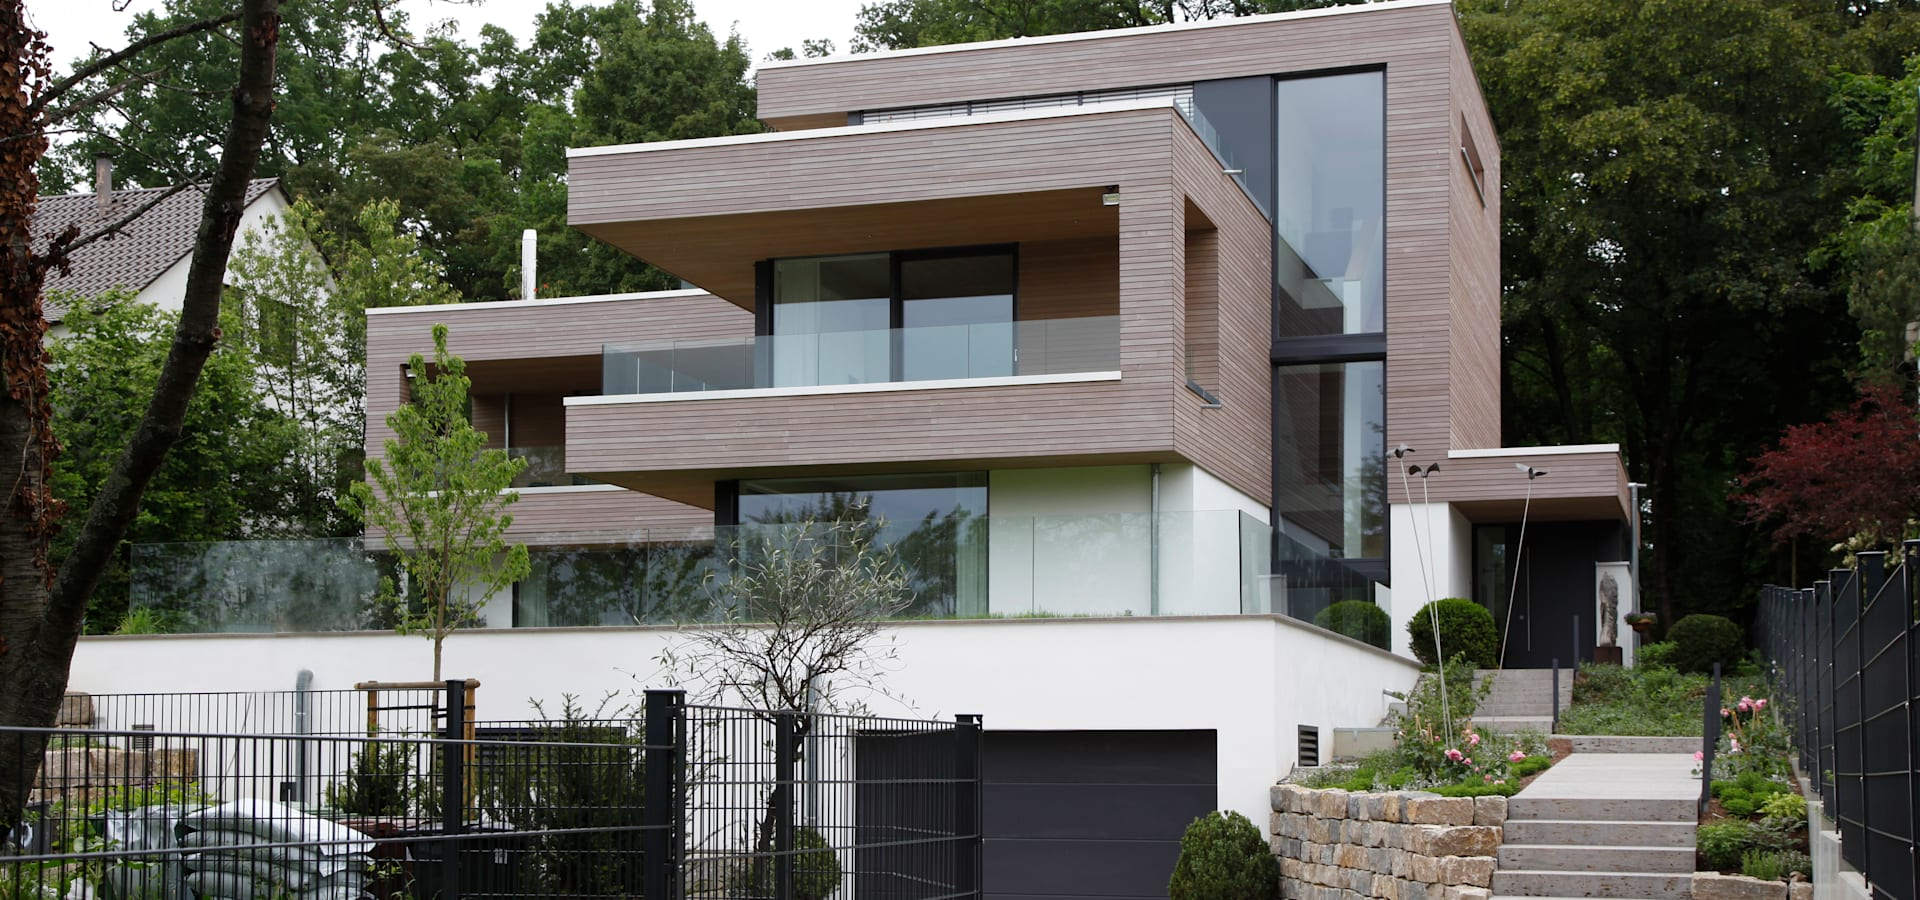 birke architekten architekten in ludwigsburg homify. Black Bedroom Furniture Sets. Home Design Ideas